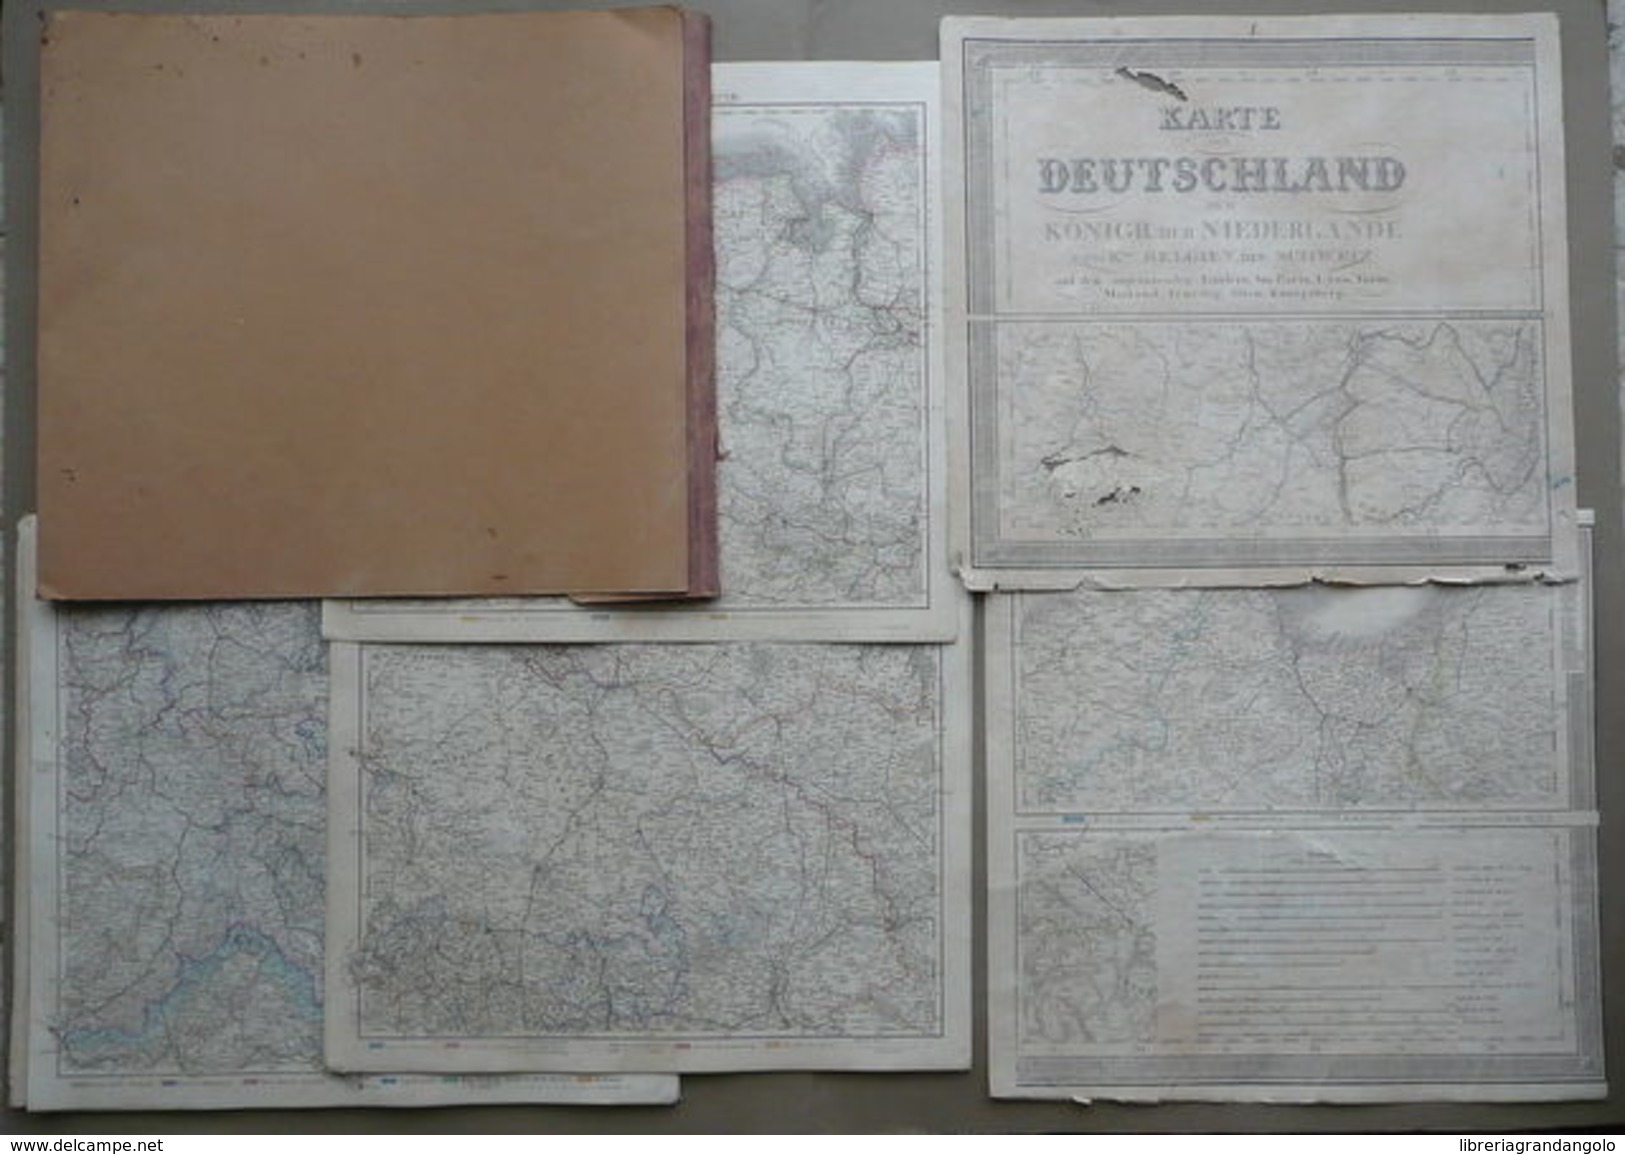 Stielers Karte Deutschland 25 Carte Stieler Germania Geografia 1869 Cartografia - Altri